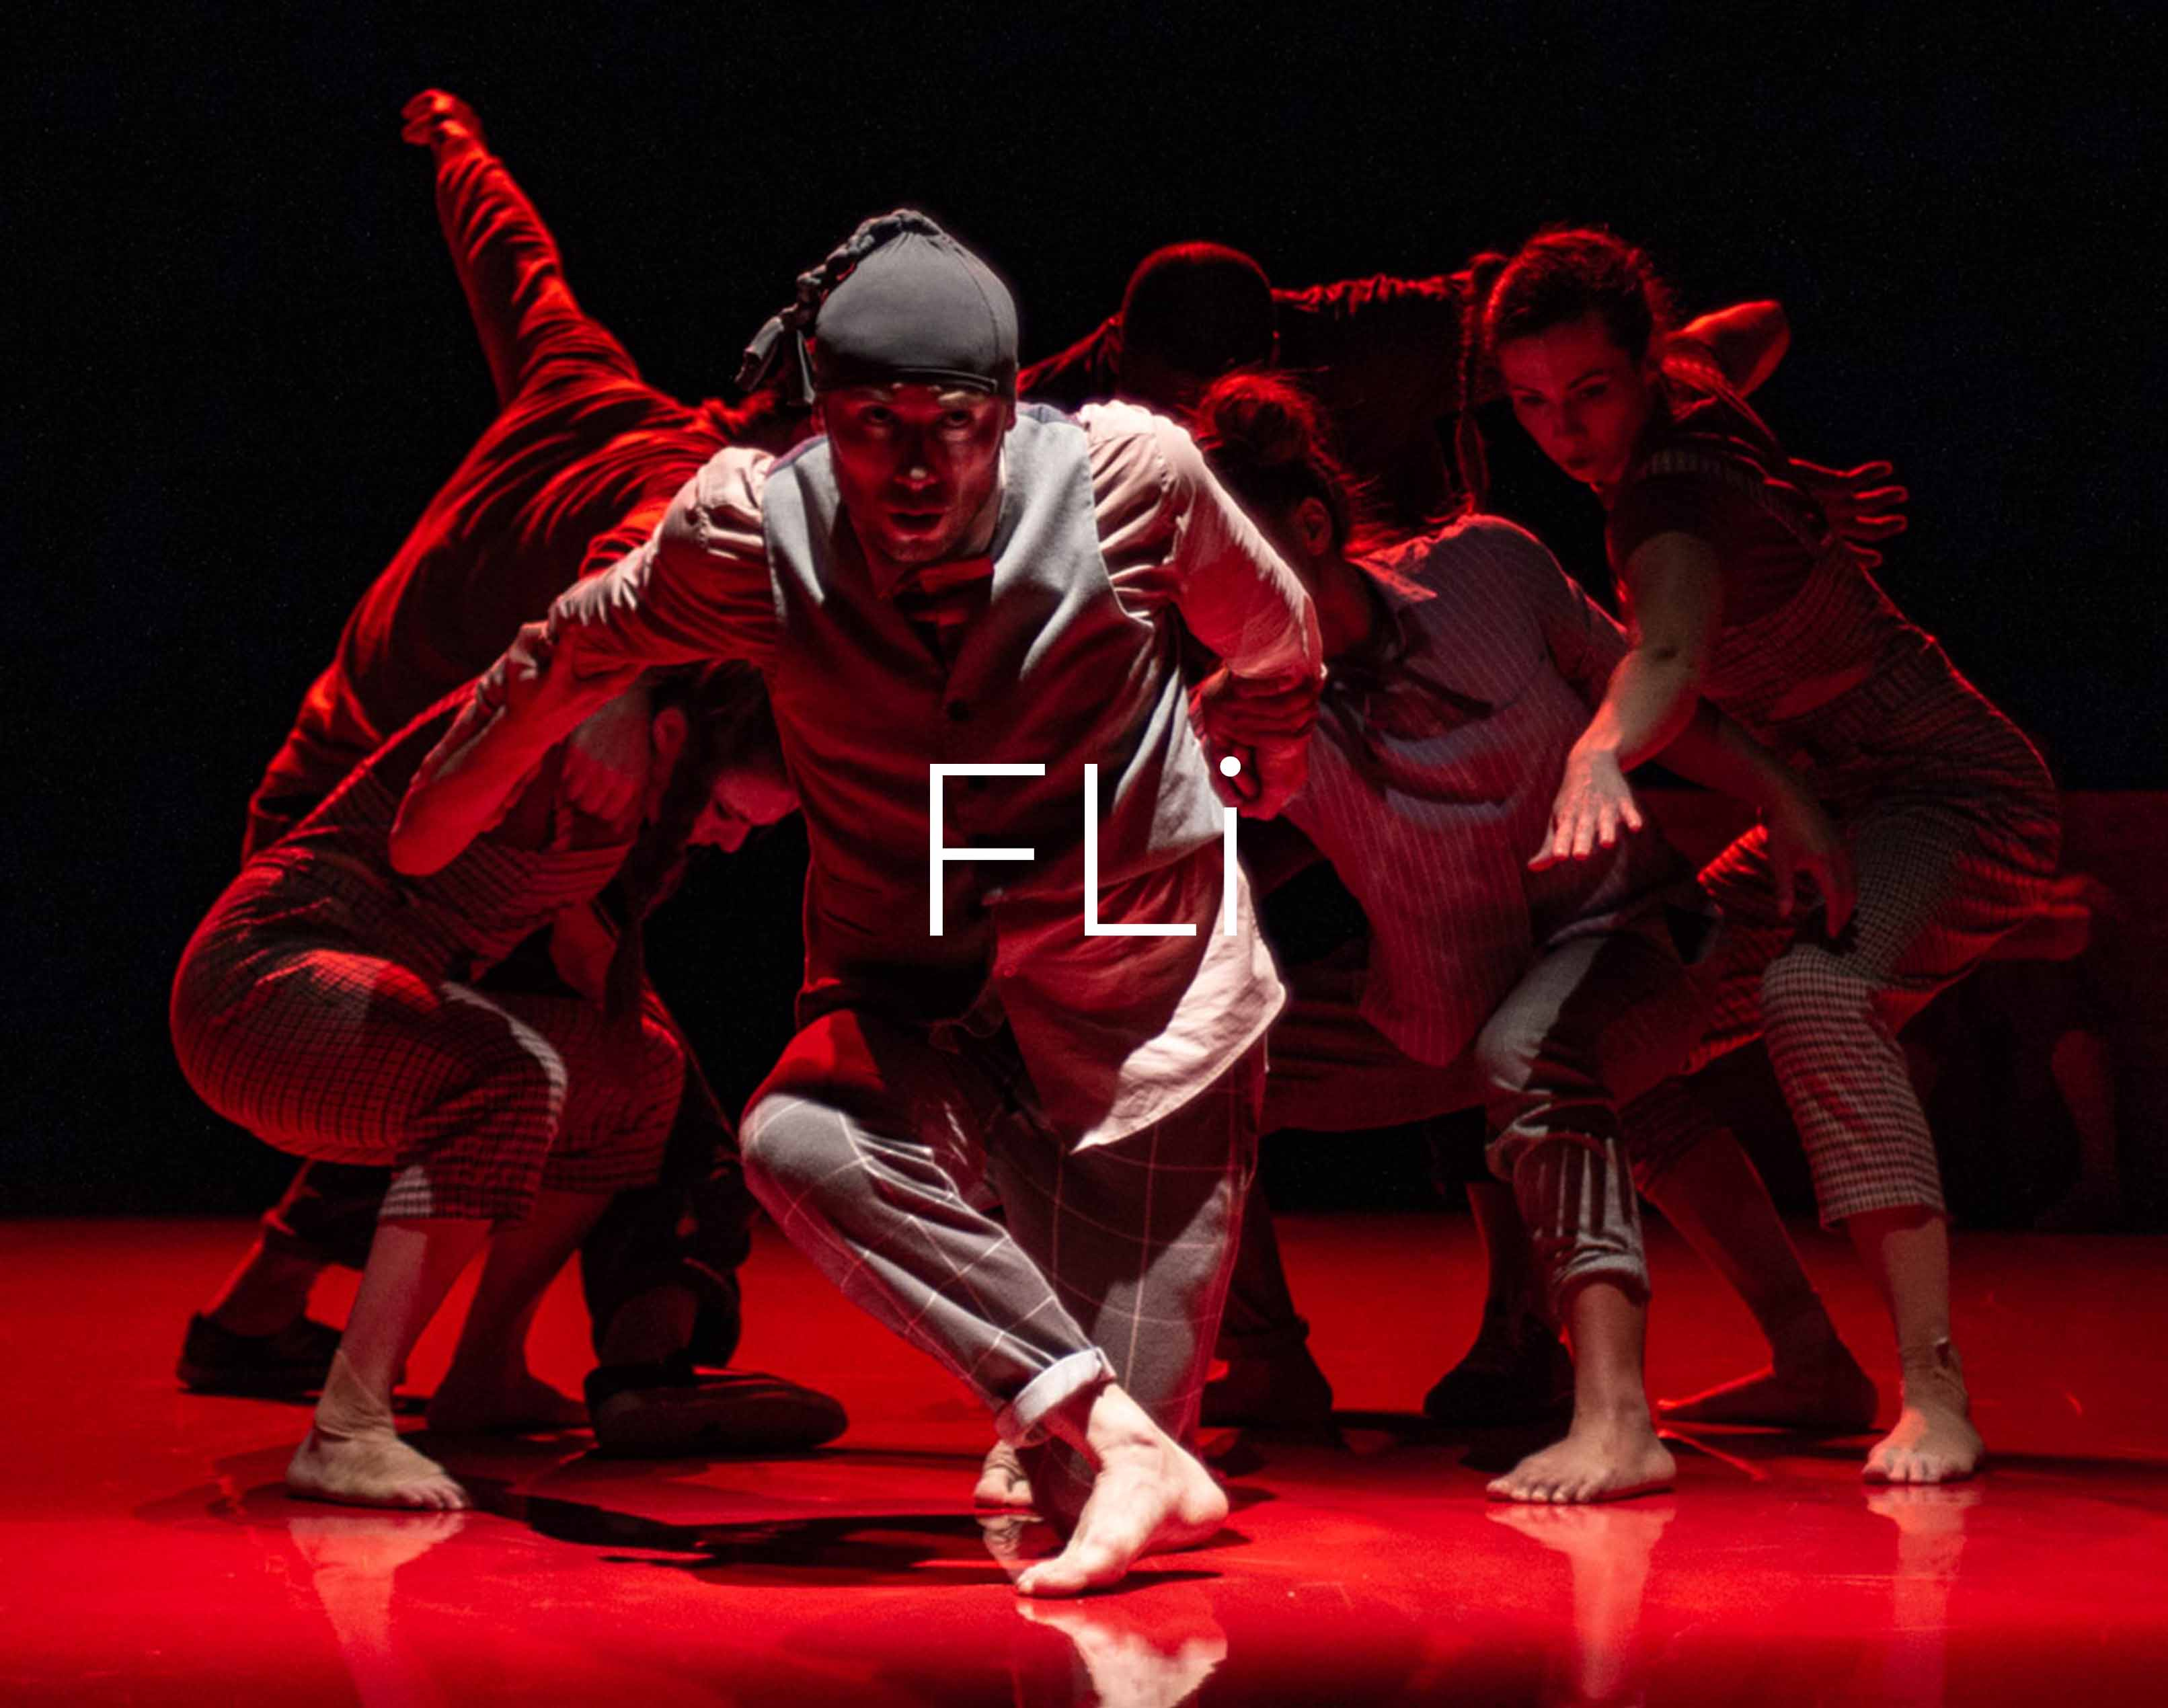 Fli-cover